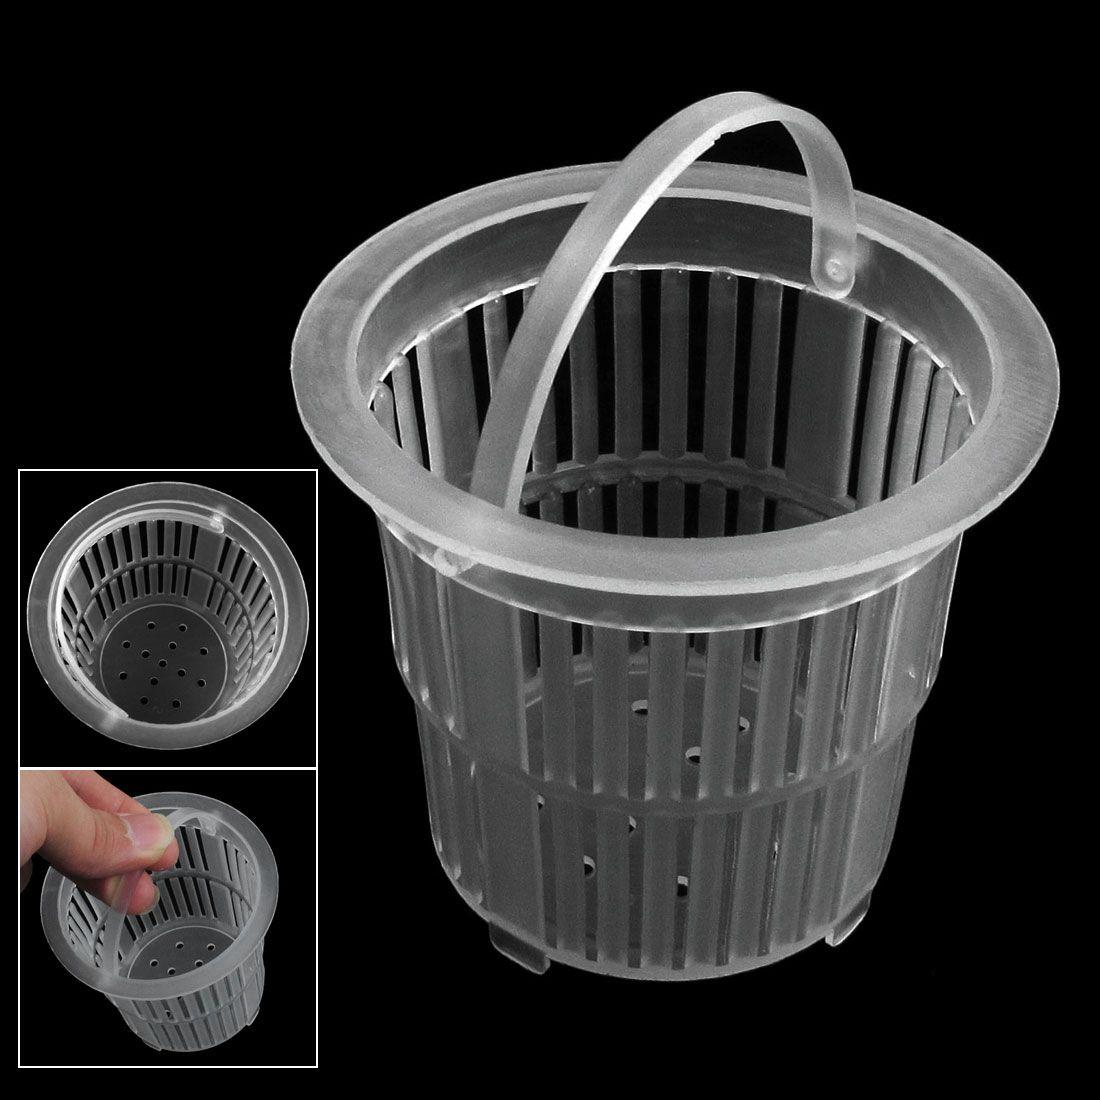 wash basin water sink white plastic basket shape drainer strainer - Strainer Basket